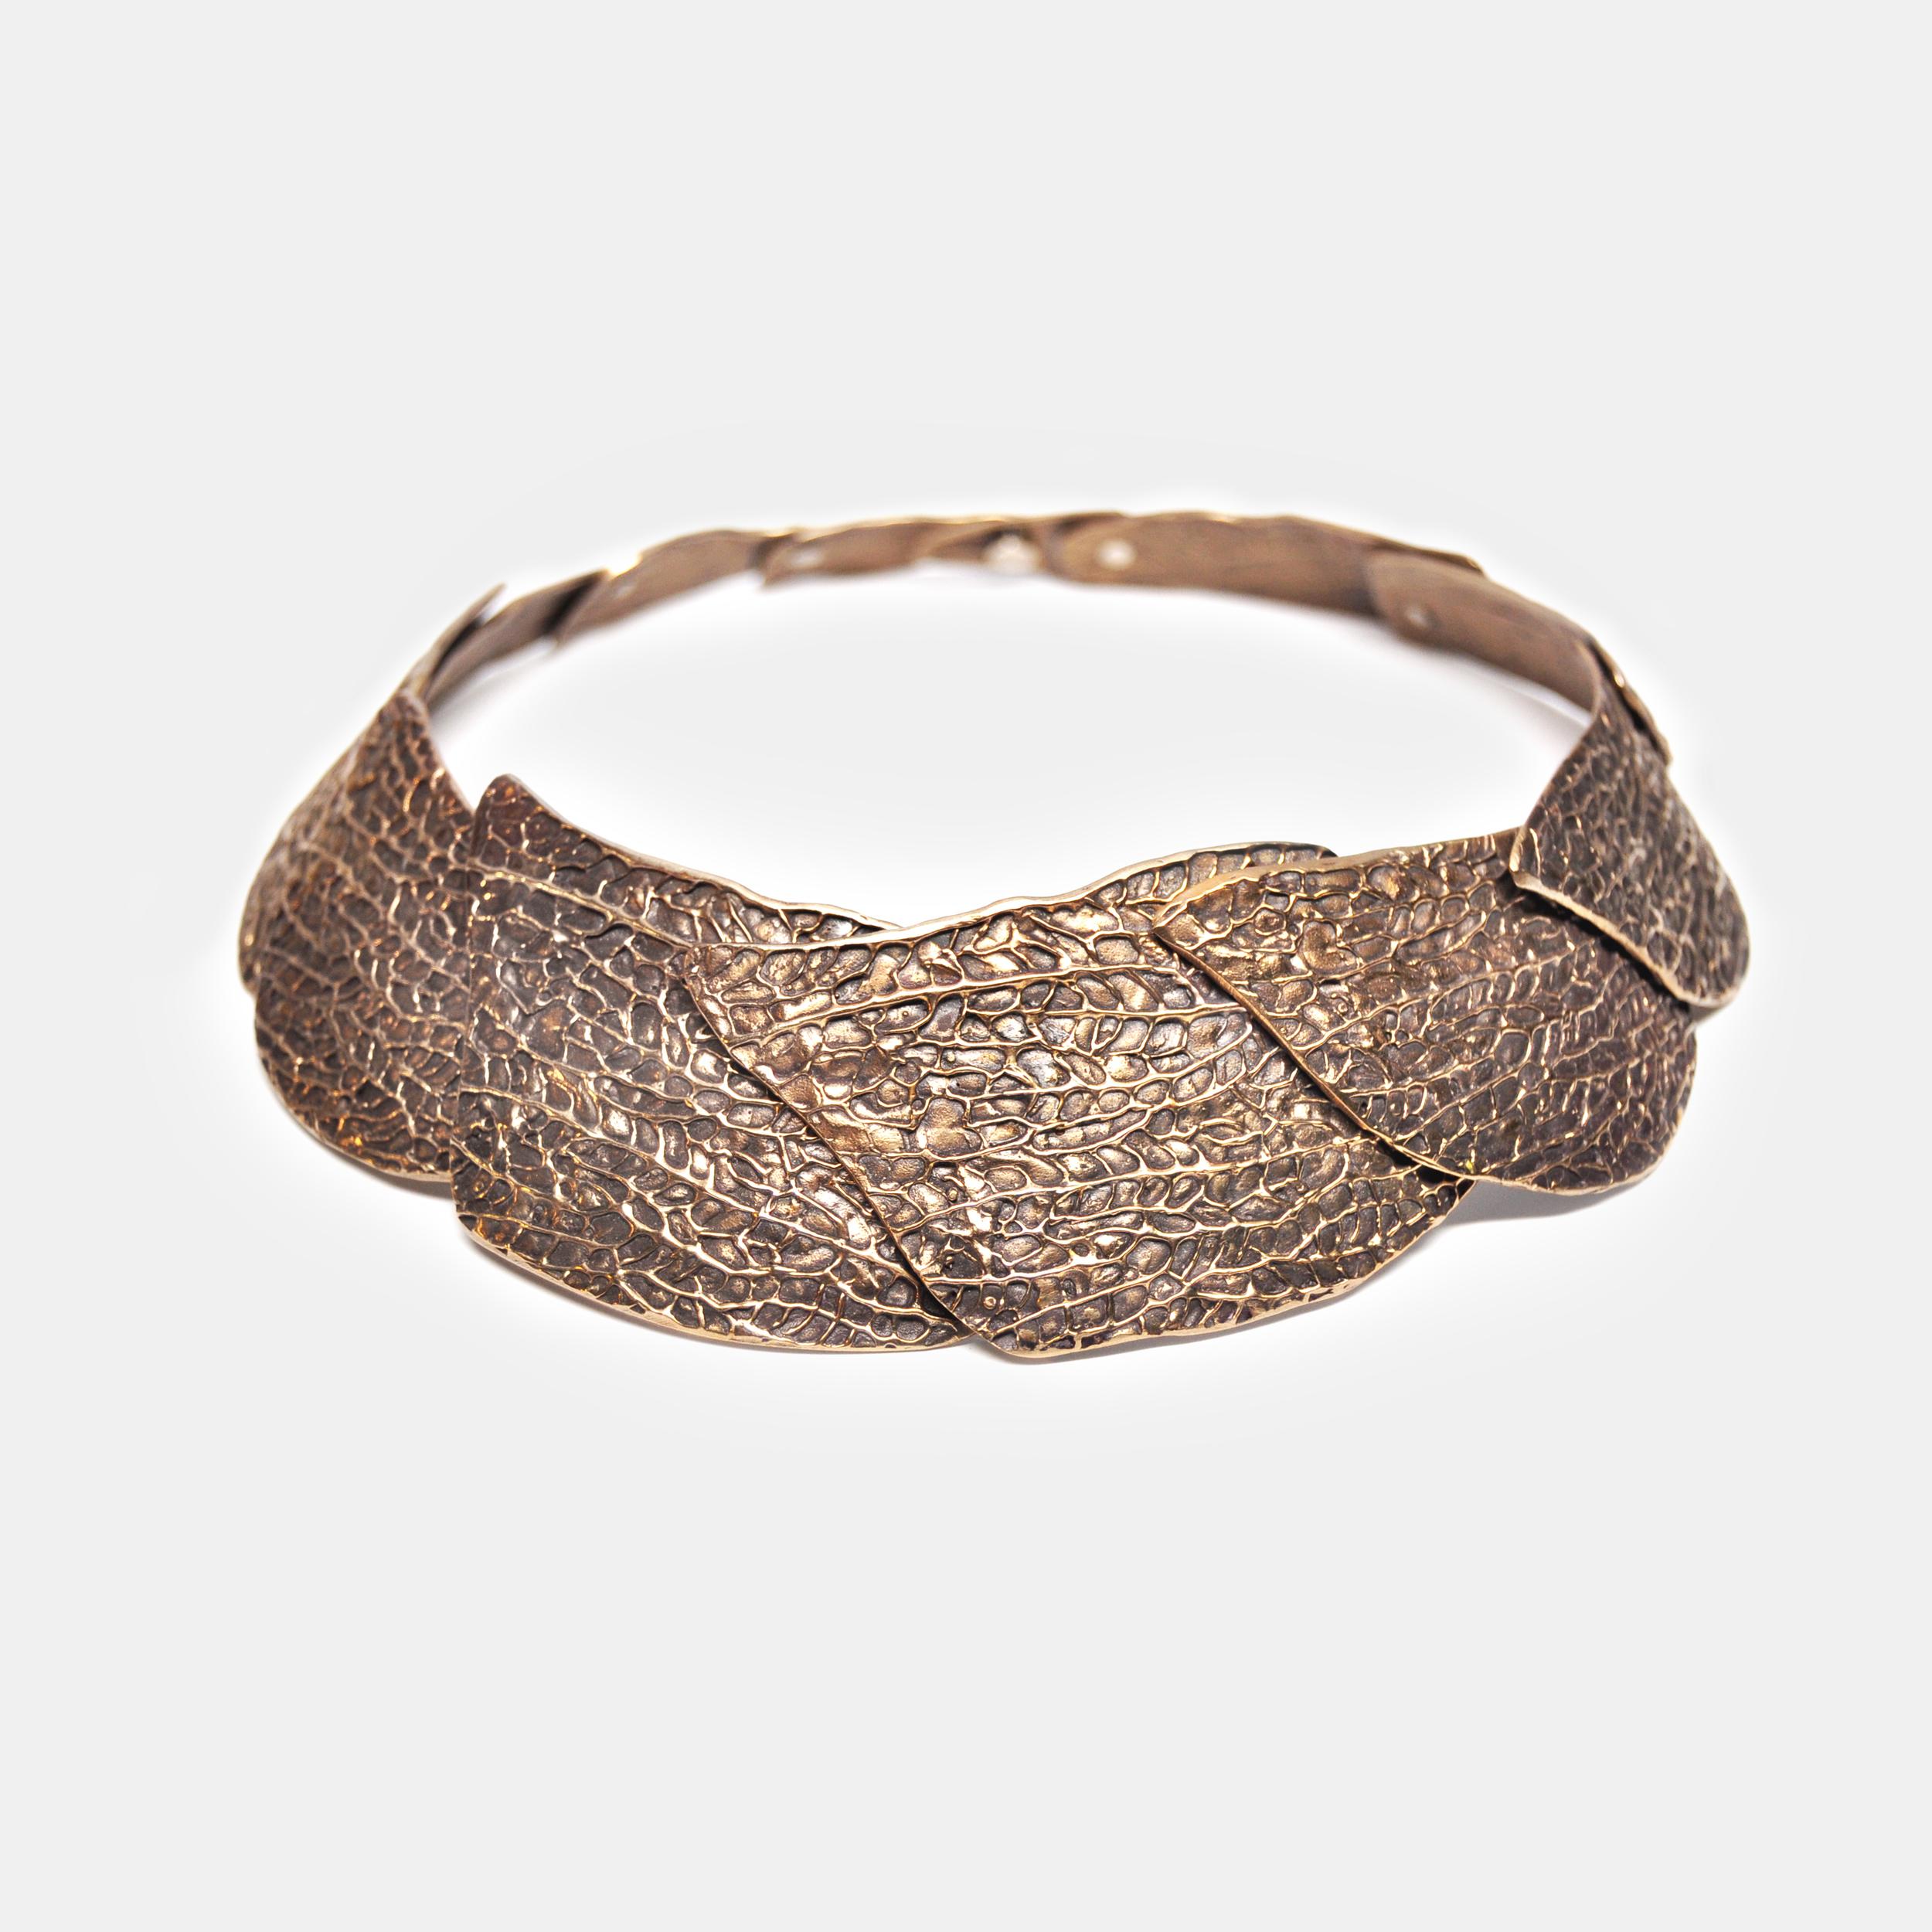 Marisa_Lomonaco_Hudson_Valley_custom_Jewelry_0004_Bronze_Coral_Lace_Necklace.jpg